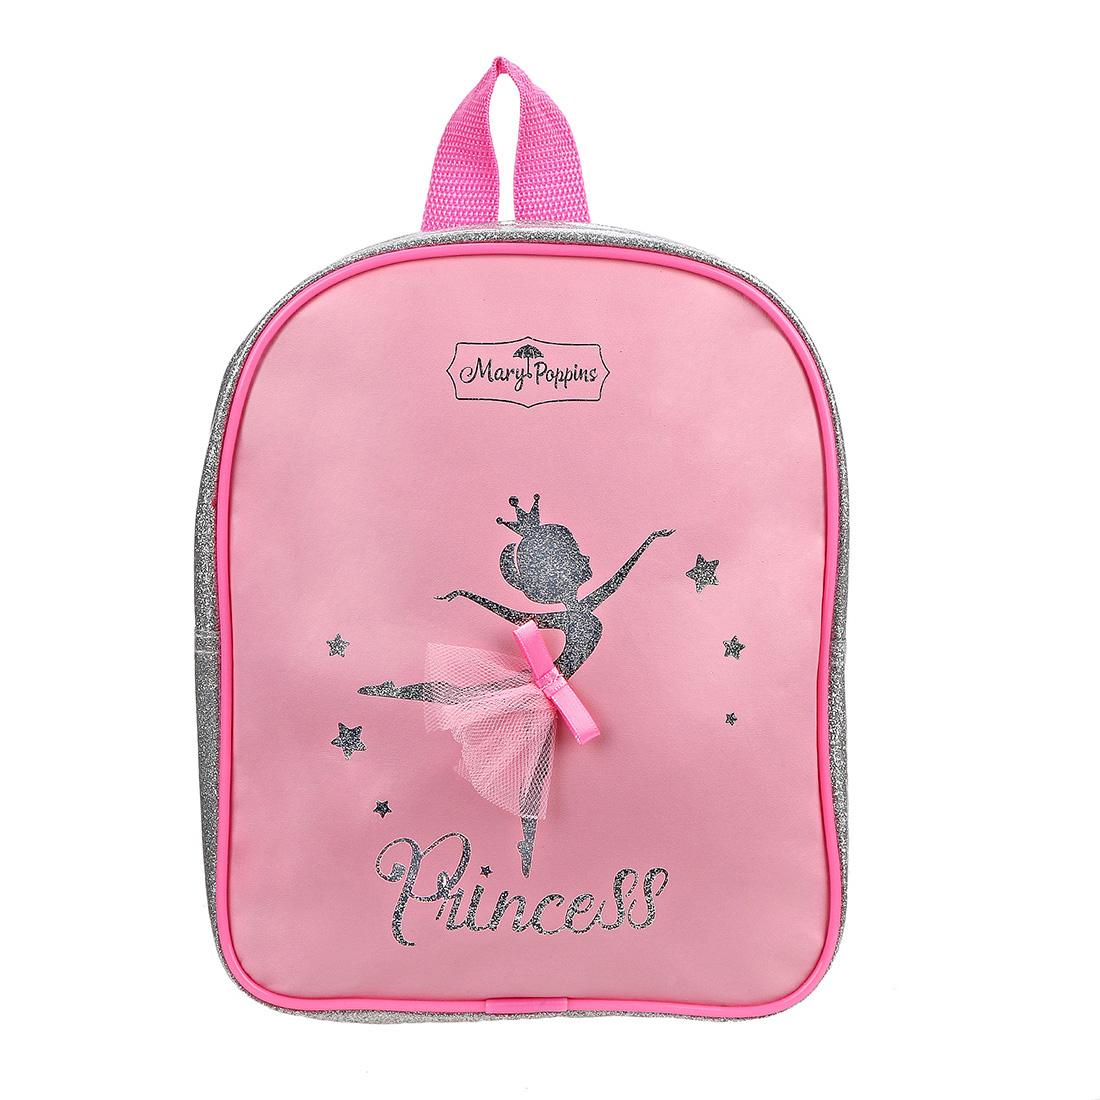 Рюкзак Mary Poppins Принцесса рюкзак mary poppins принцесса